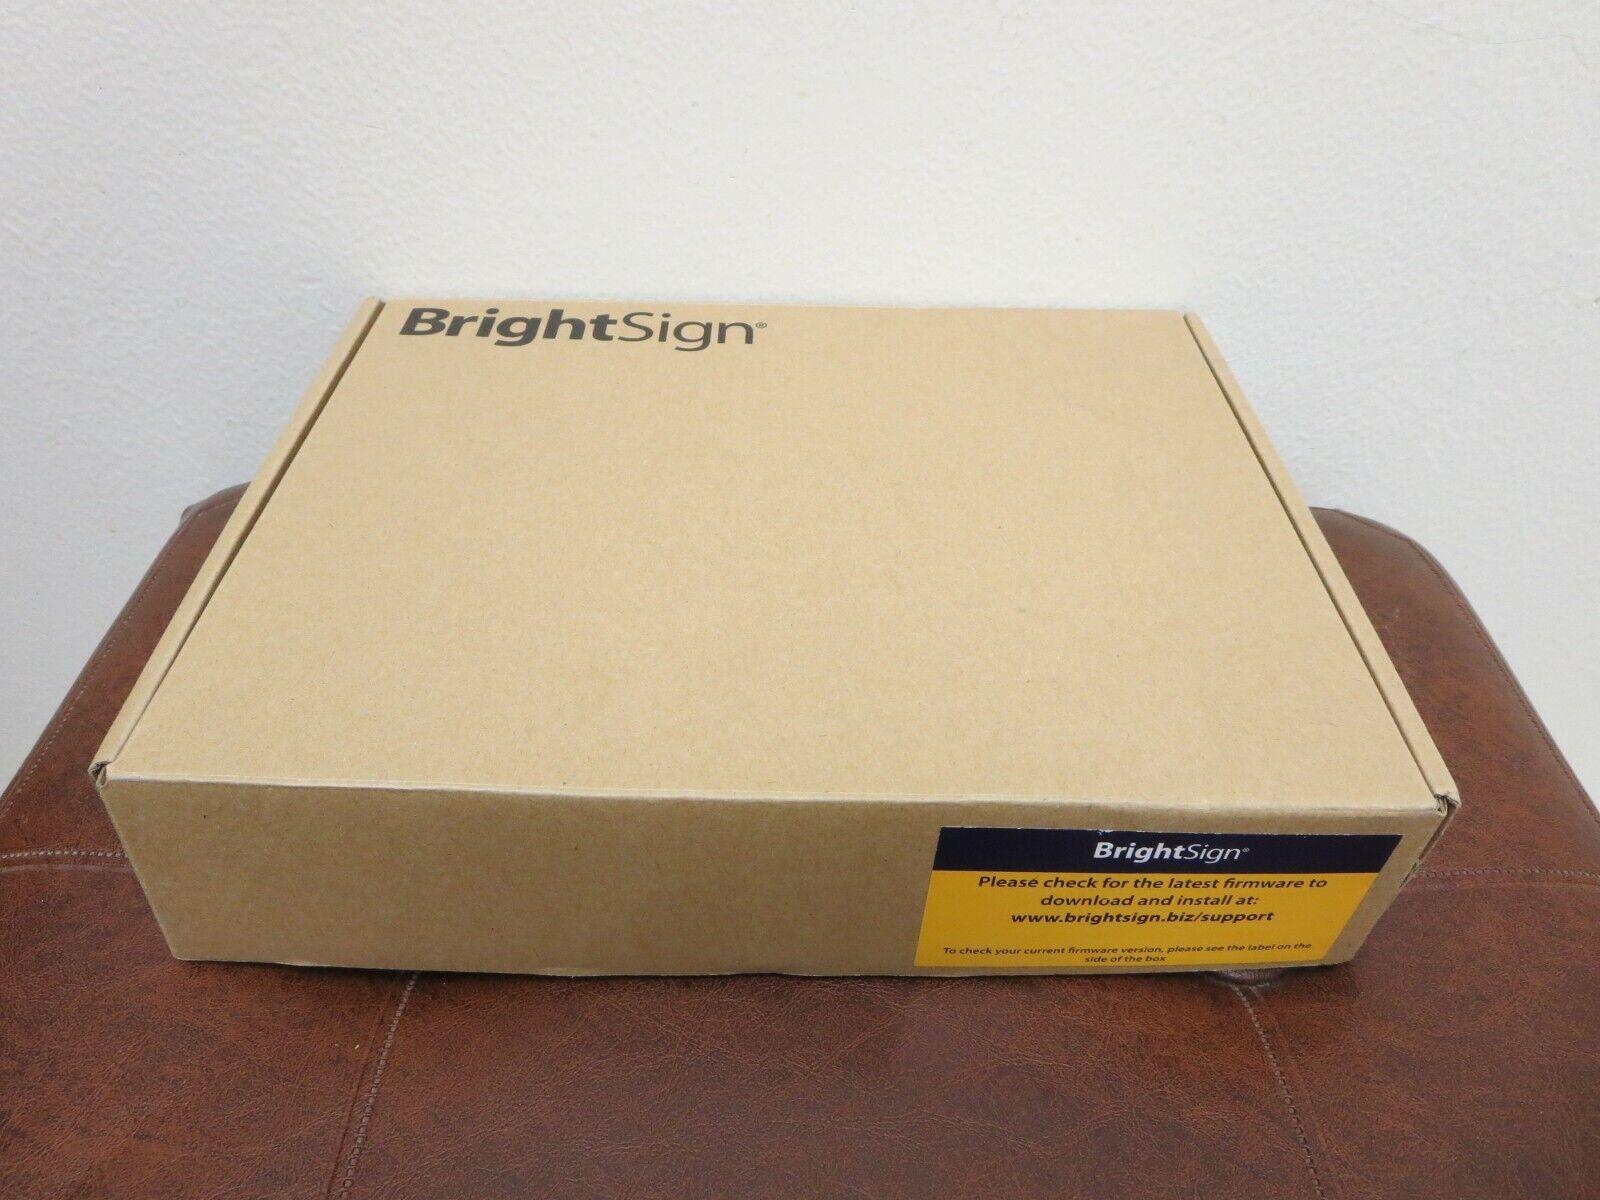 BrightSign XD230 Streaming Digital Signage Player - New OPEN BOX. NO SD CARD. brightsign digital new open player signage streaming xd230